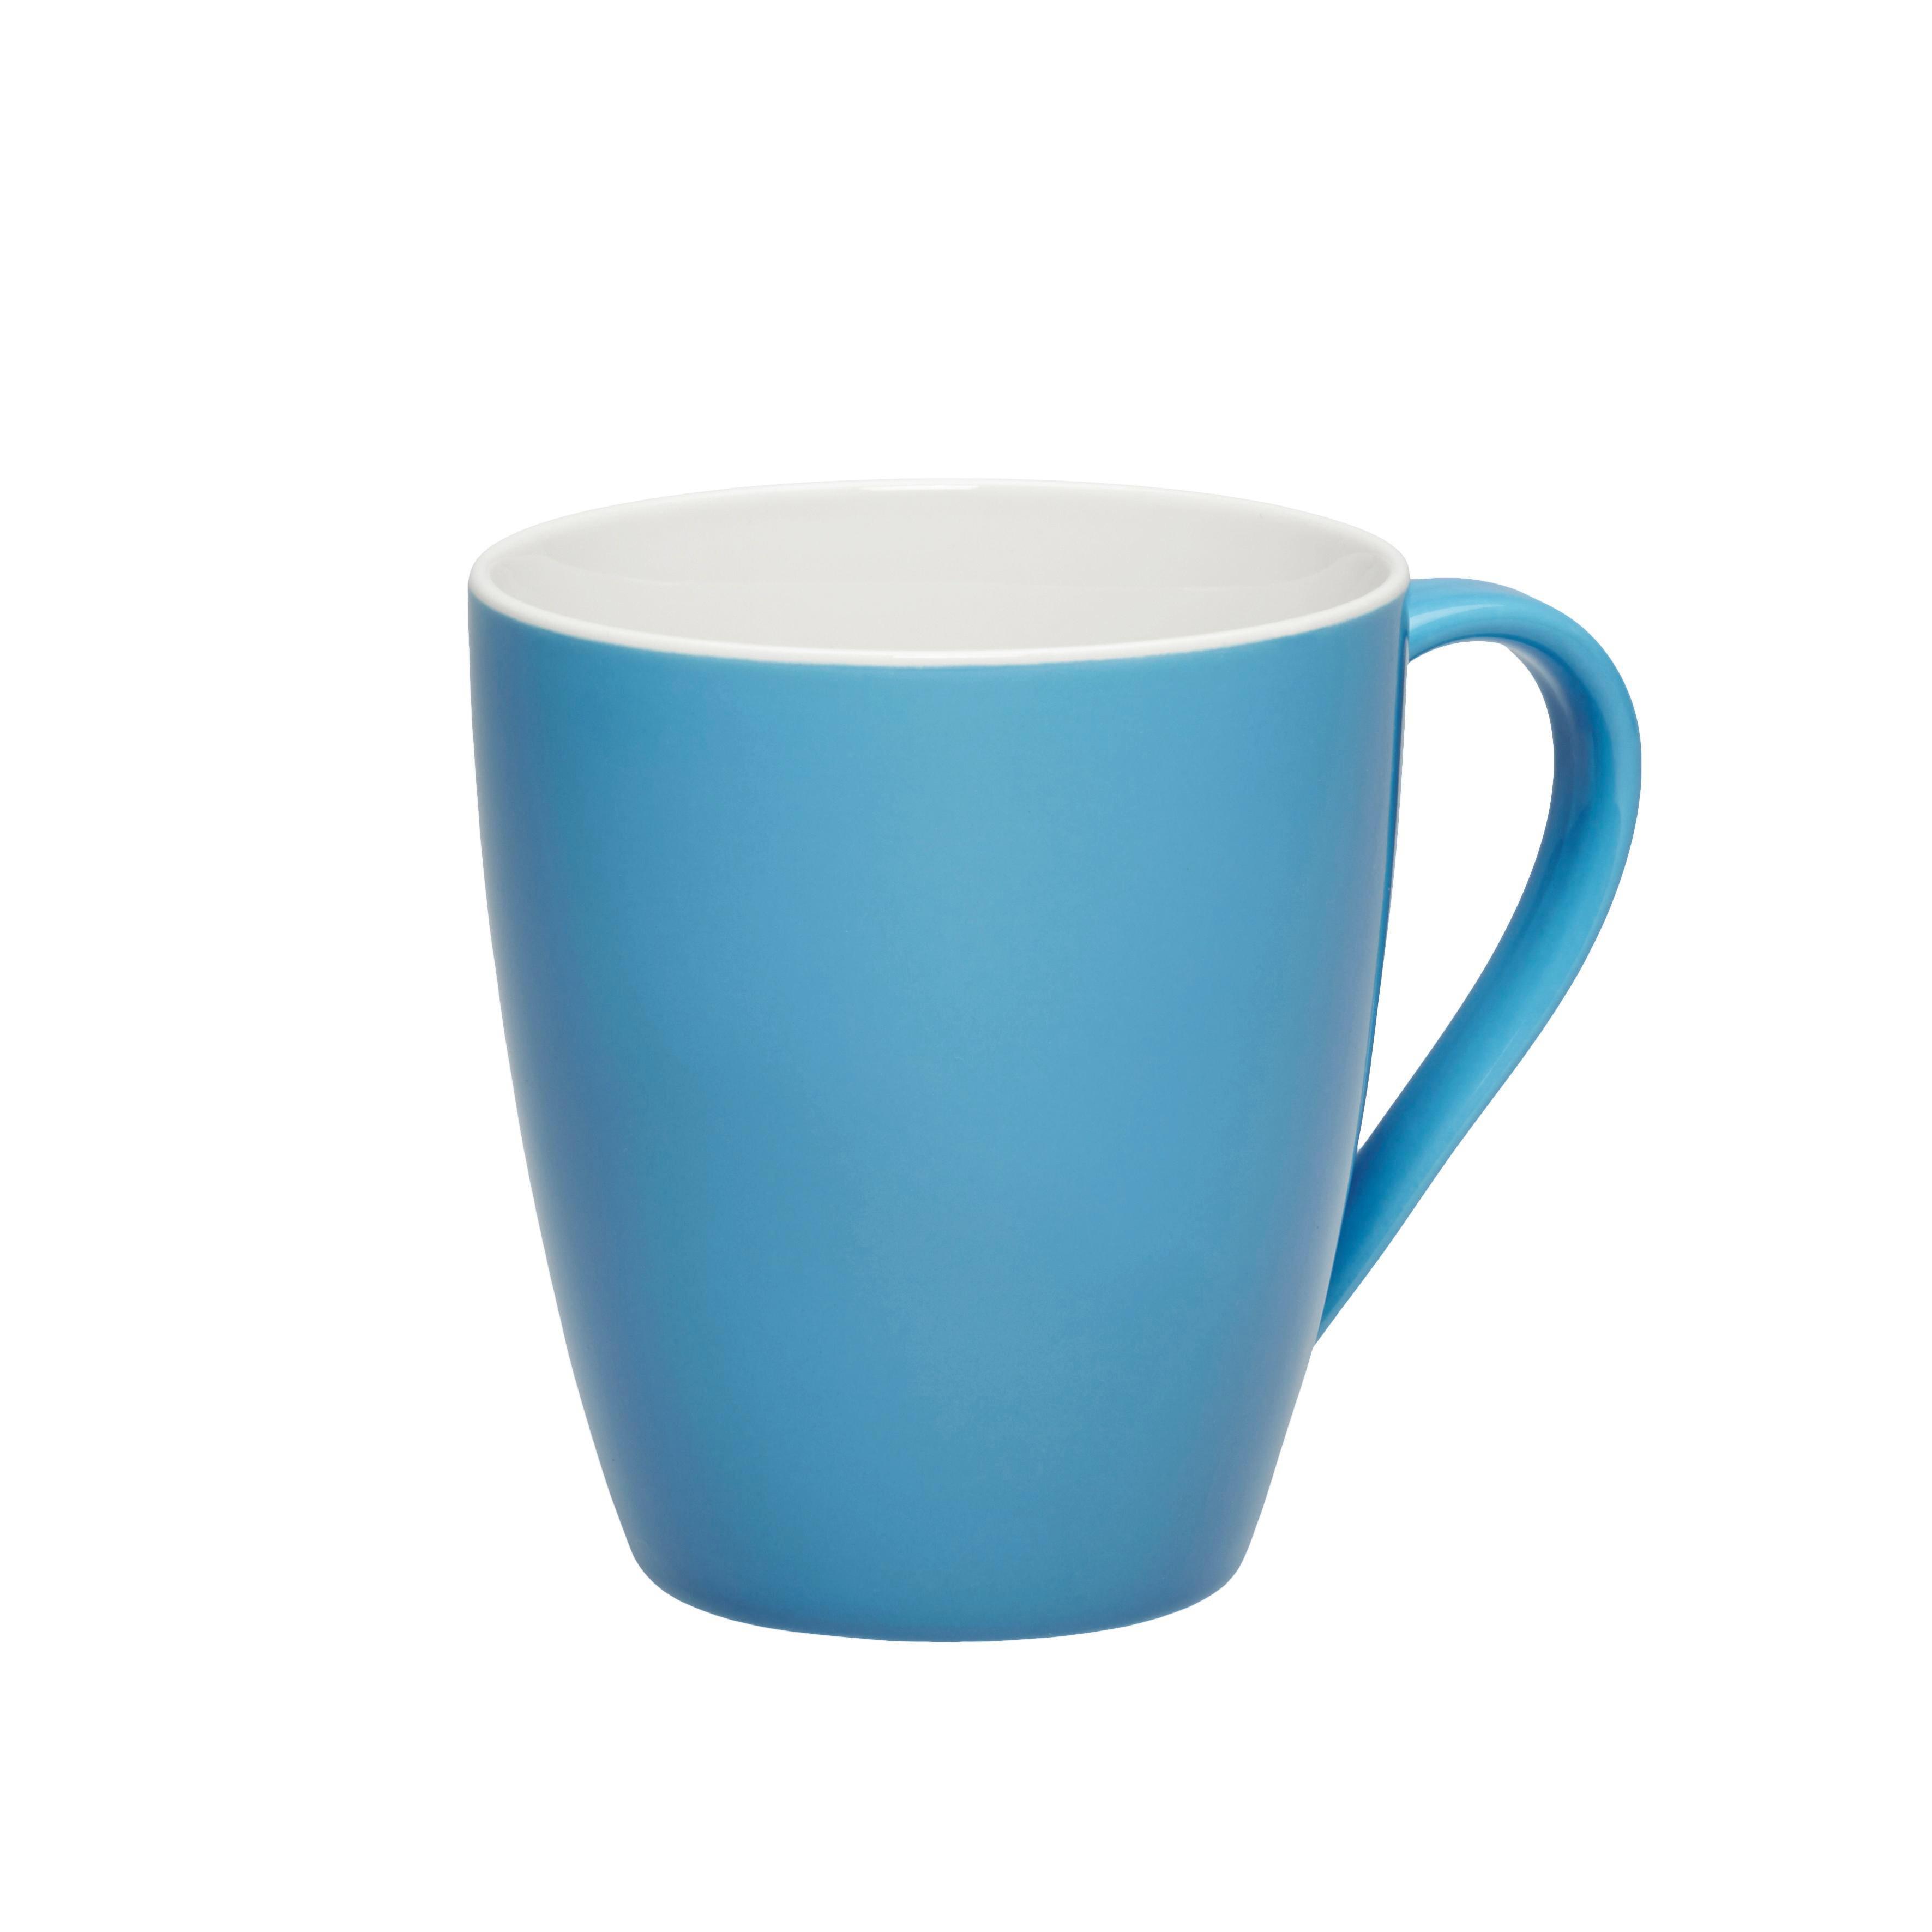 Kaffeebecher Sandy in Türkis aus Keramik - Türkis, KONVENTIONELL, Keramik (8,9/10cm) - MÖMAX modern living